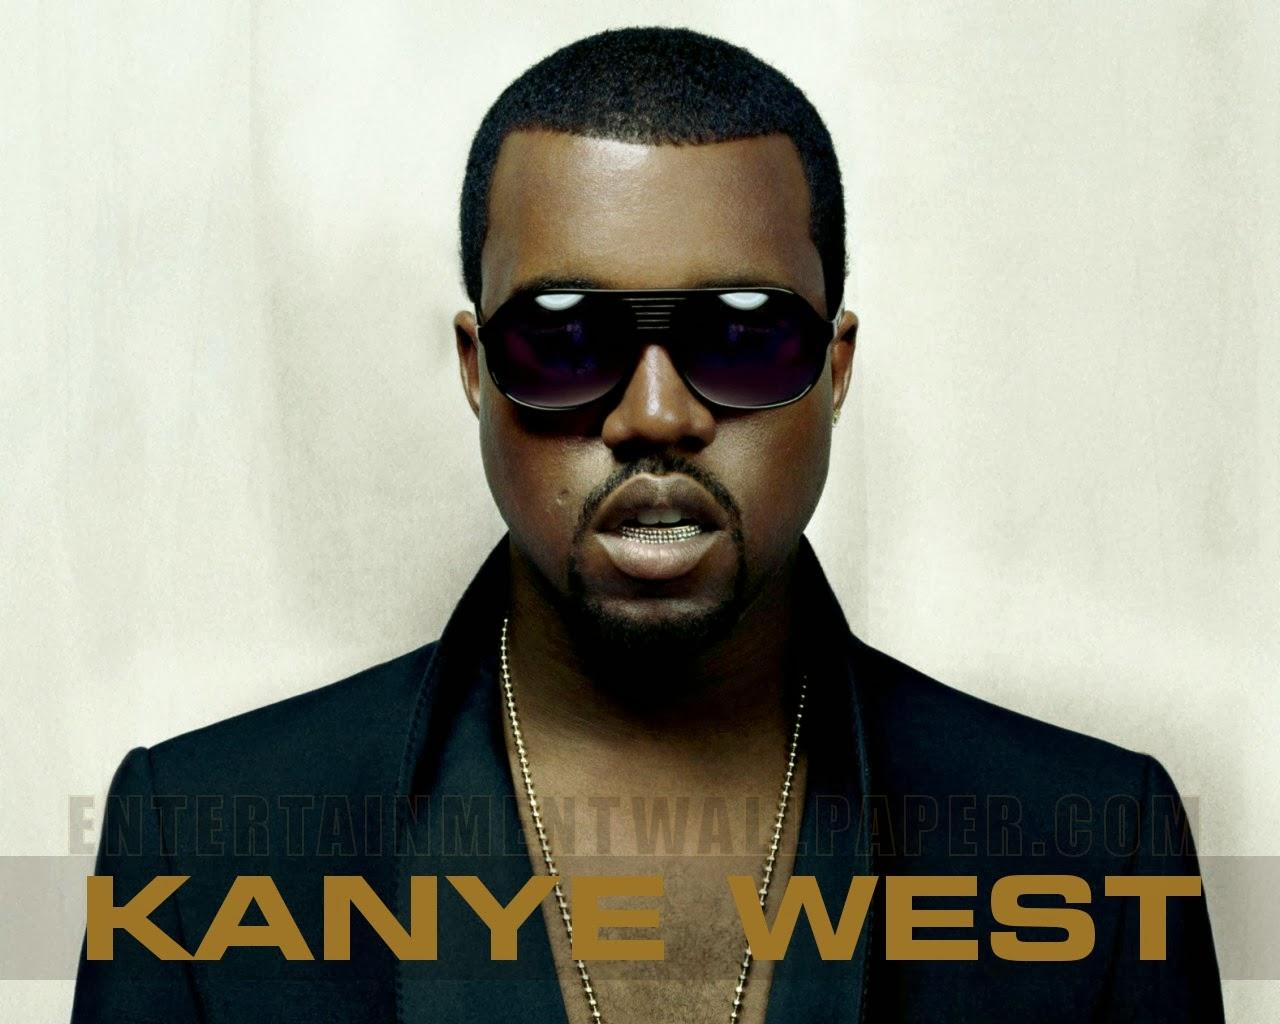 "<img src=""http://2.bp.blogspot.com/-LKfZ_dHdv0M/Ut0F5xZo9kI/AAAAAAAAJPY/PNBNyyL0P7M/s1600/kanye-west-action.jpg"" alt=""kanye west action"" />"